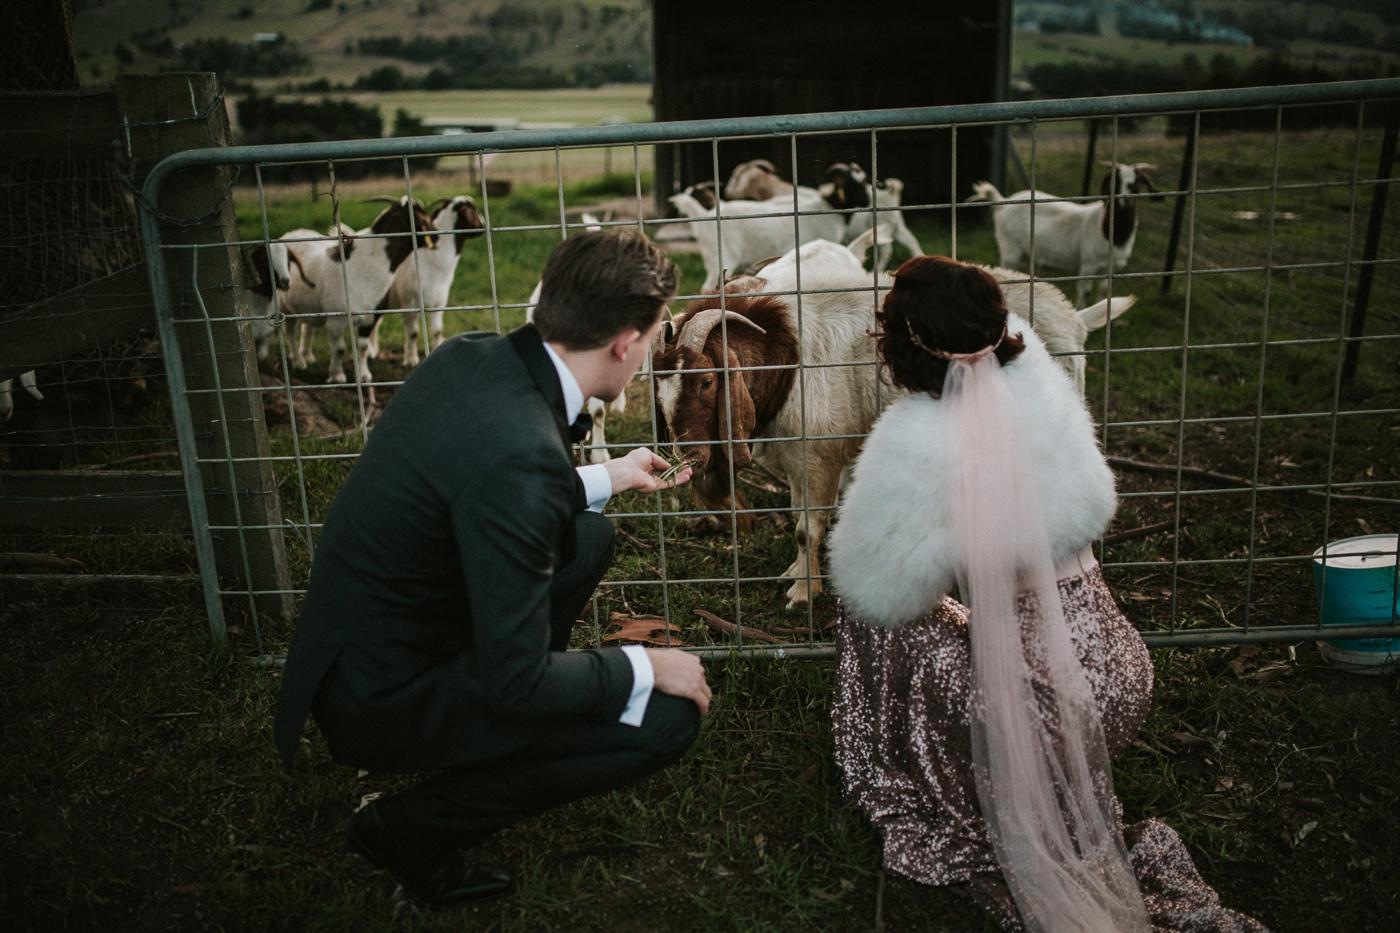 Emma&Morgan_Melbourne-Vintage-Elegant-Fun-Quirky-Yarra-Valley-Vineyard-Wedding_Melbourne-Wedding-Photography-83